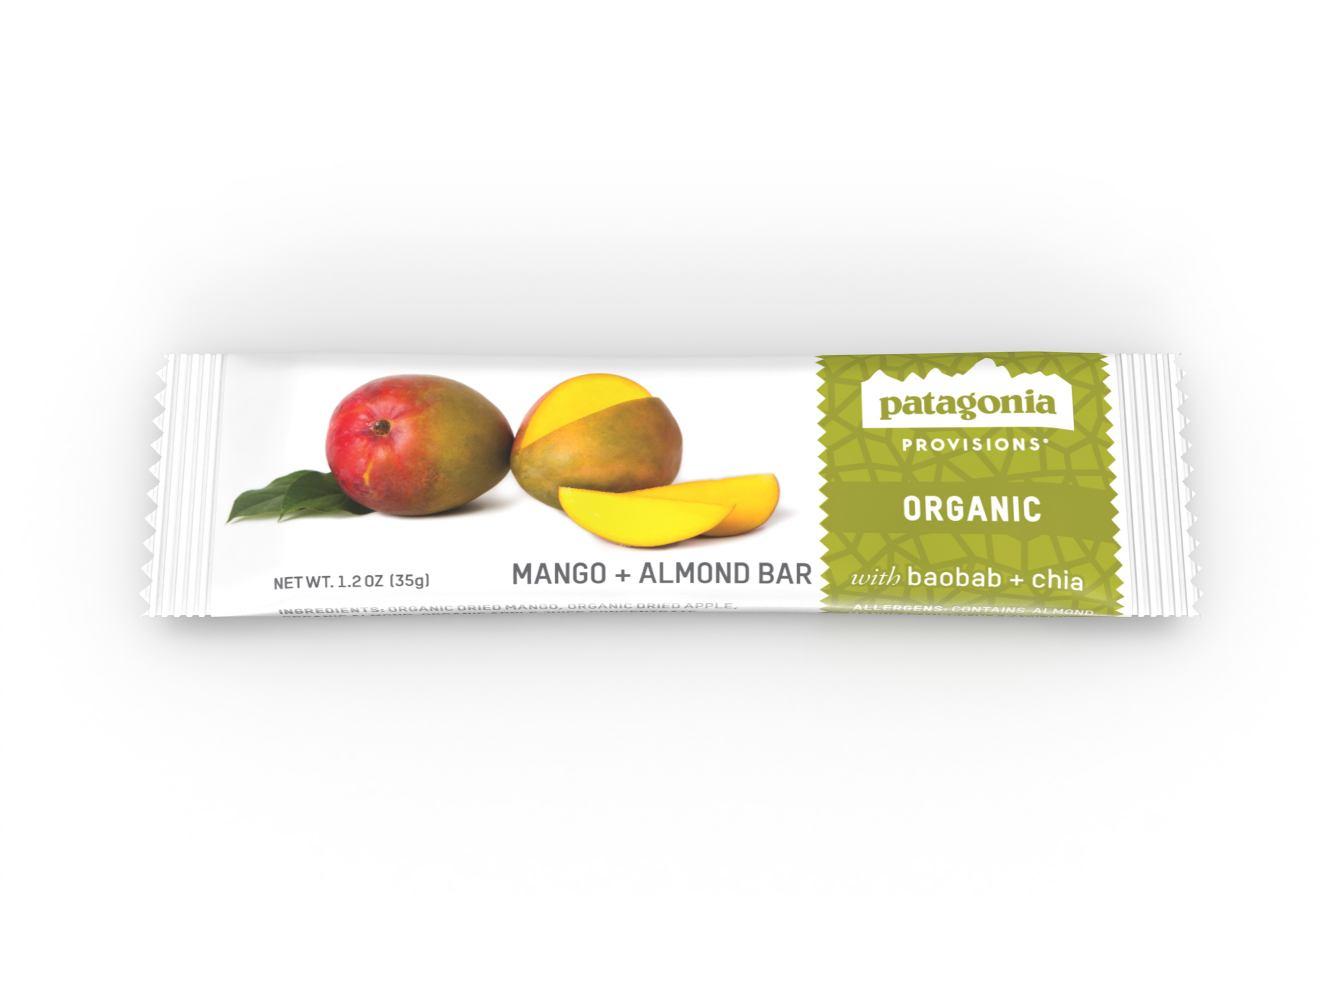 Patagonia Provisions-Organic Almond Bars